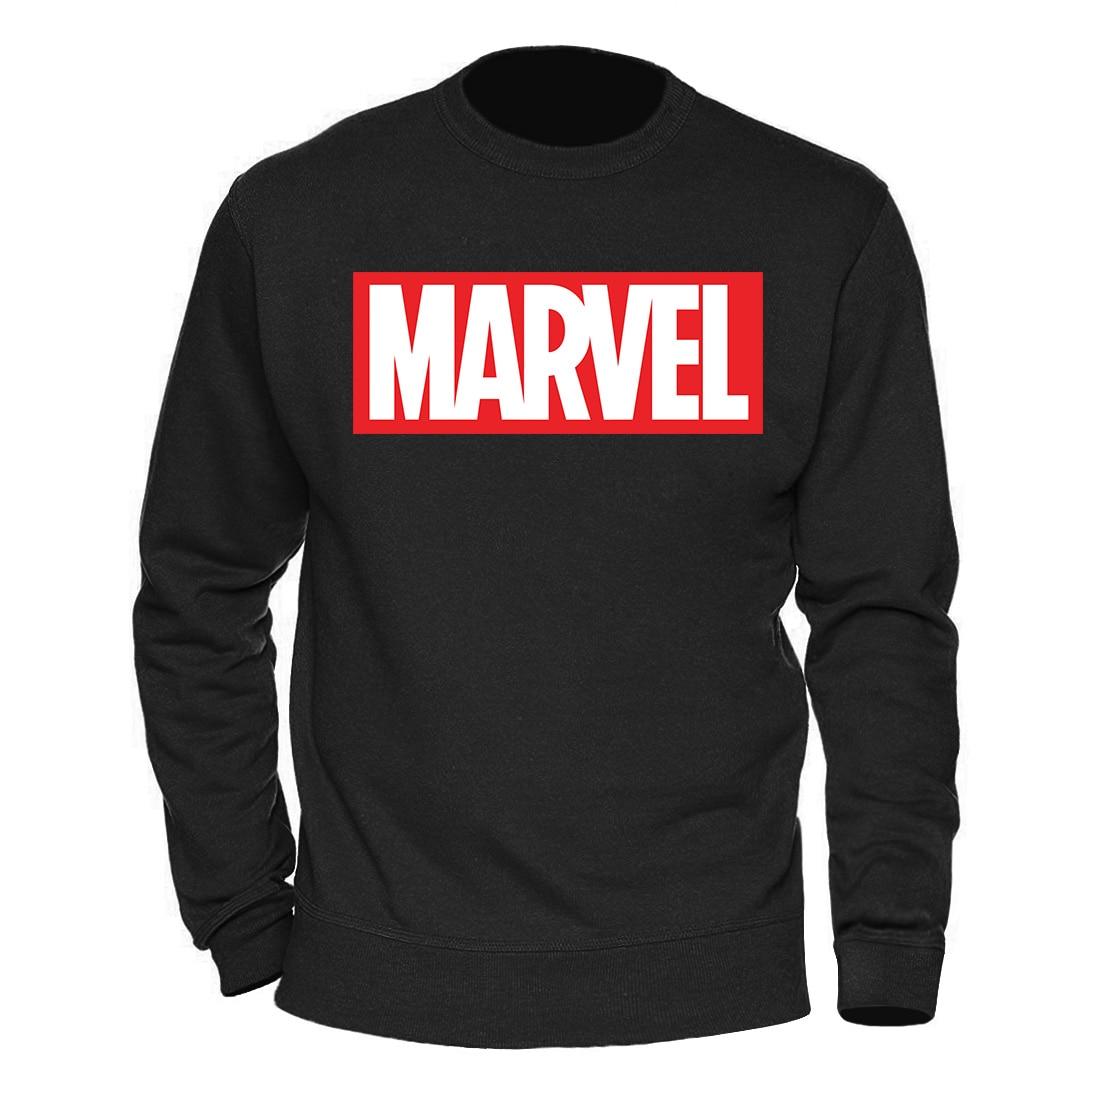 2020 Hot Nieuwste Super Hero Marvel Sweatshirts Mode Suprem Mannen Marvel Cool Gedrukt Sweatshirts Streetwear Mannen Kleding